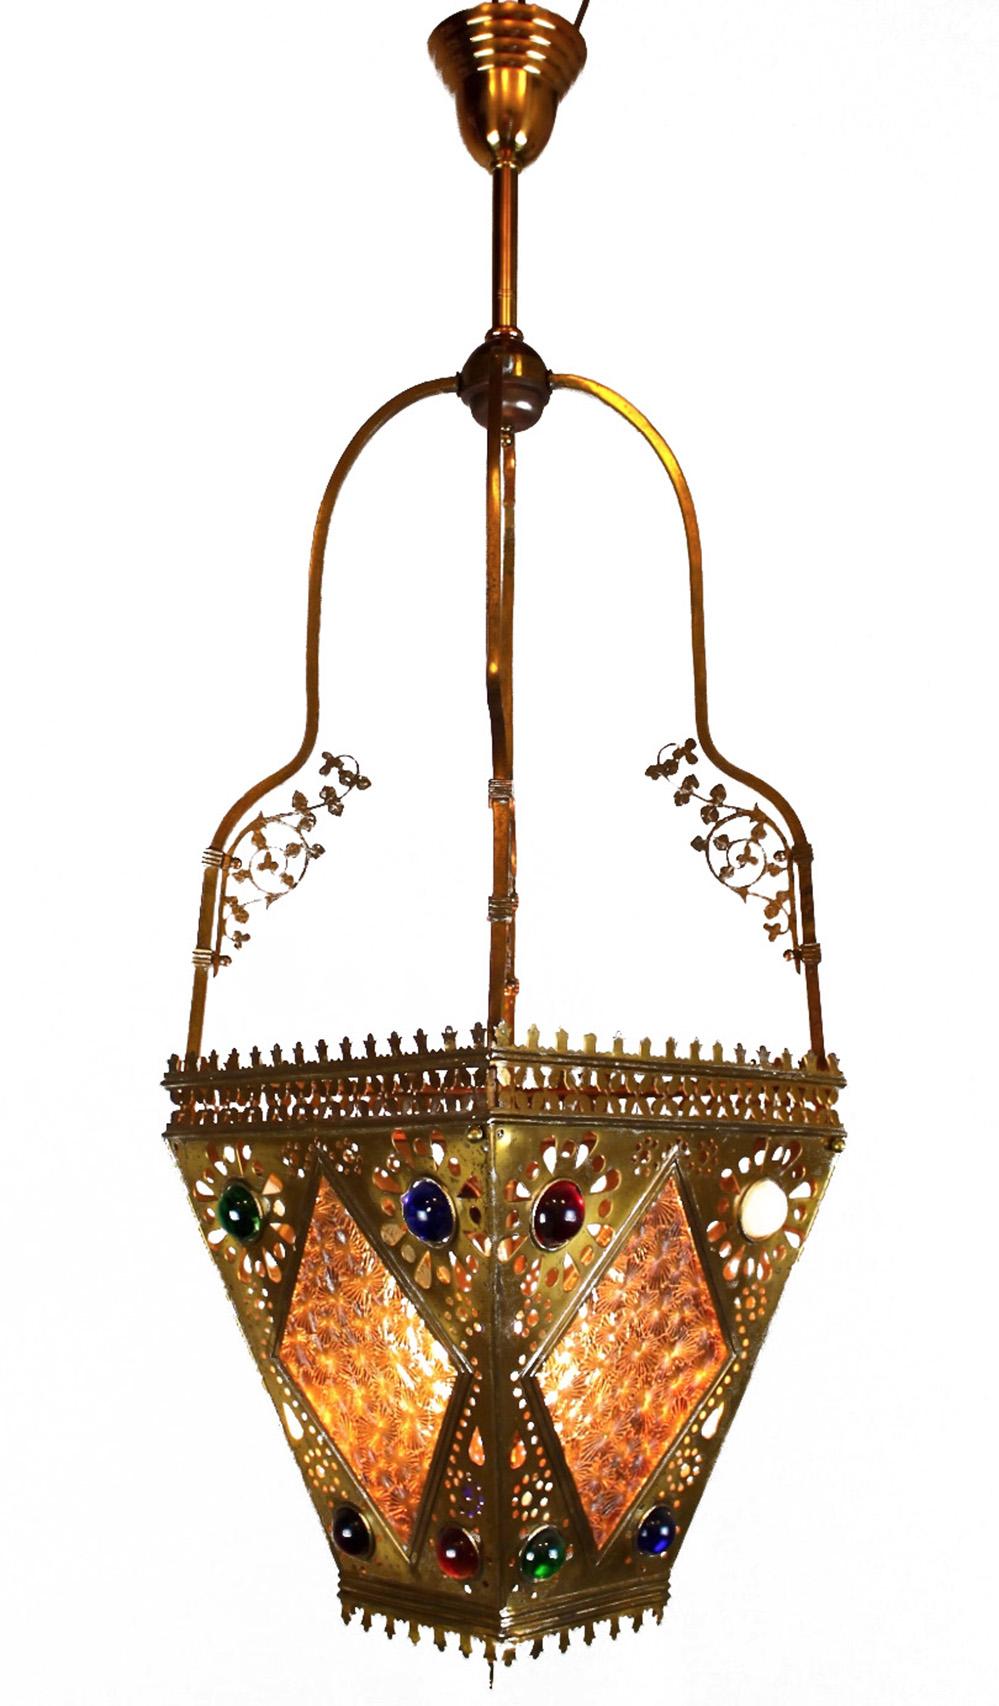 Victorian Aesthetic Movement Hall Lantern Modernism